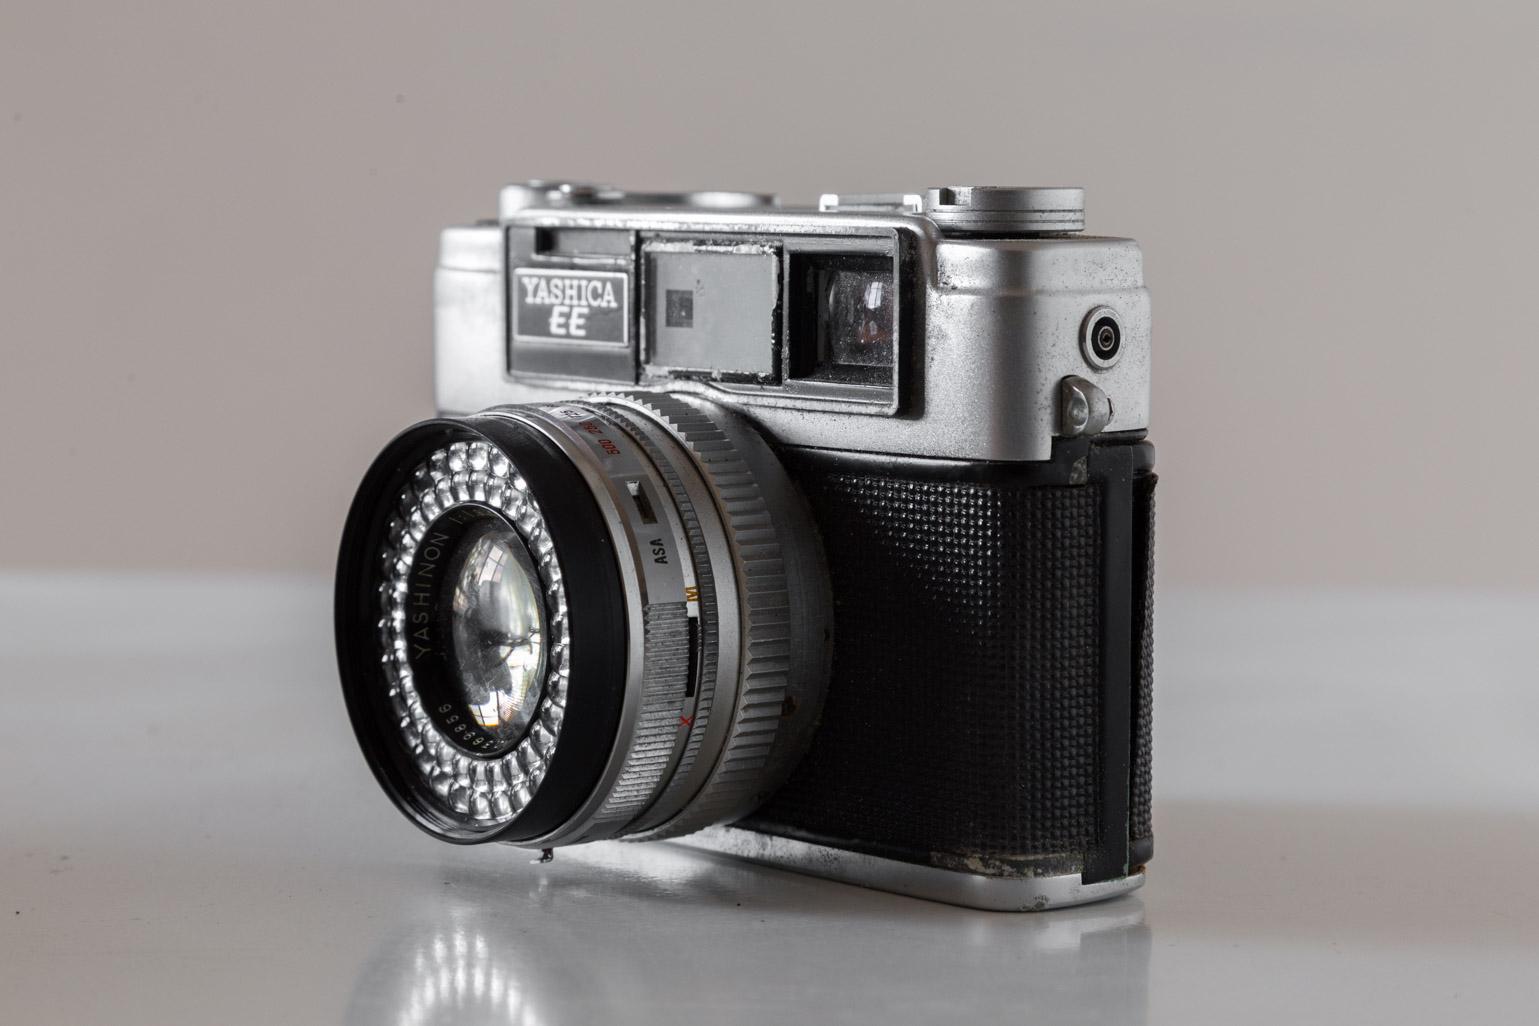 yashica-ee-camera